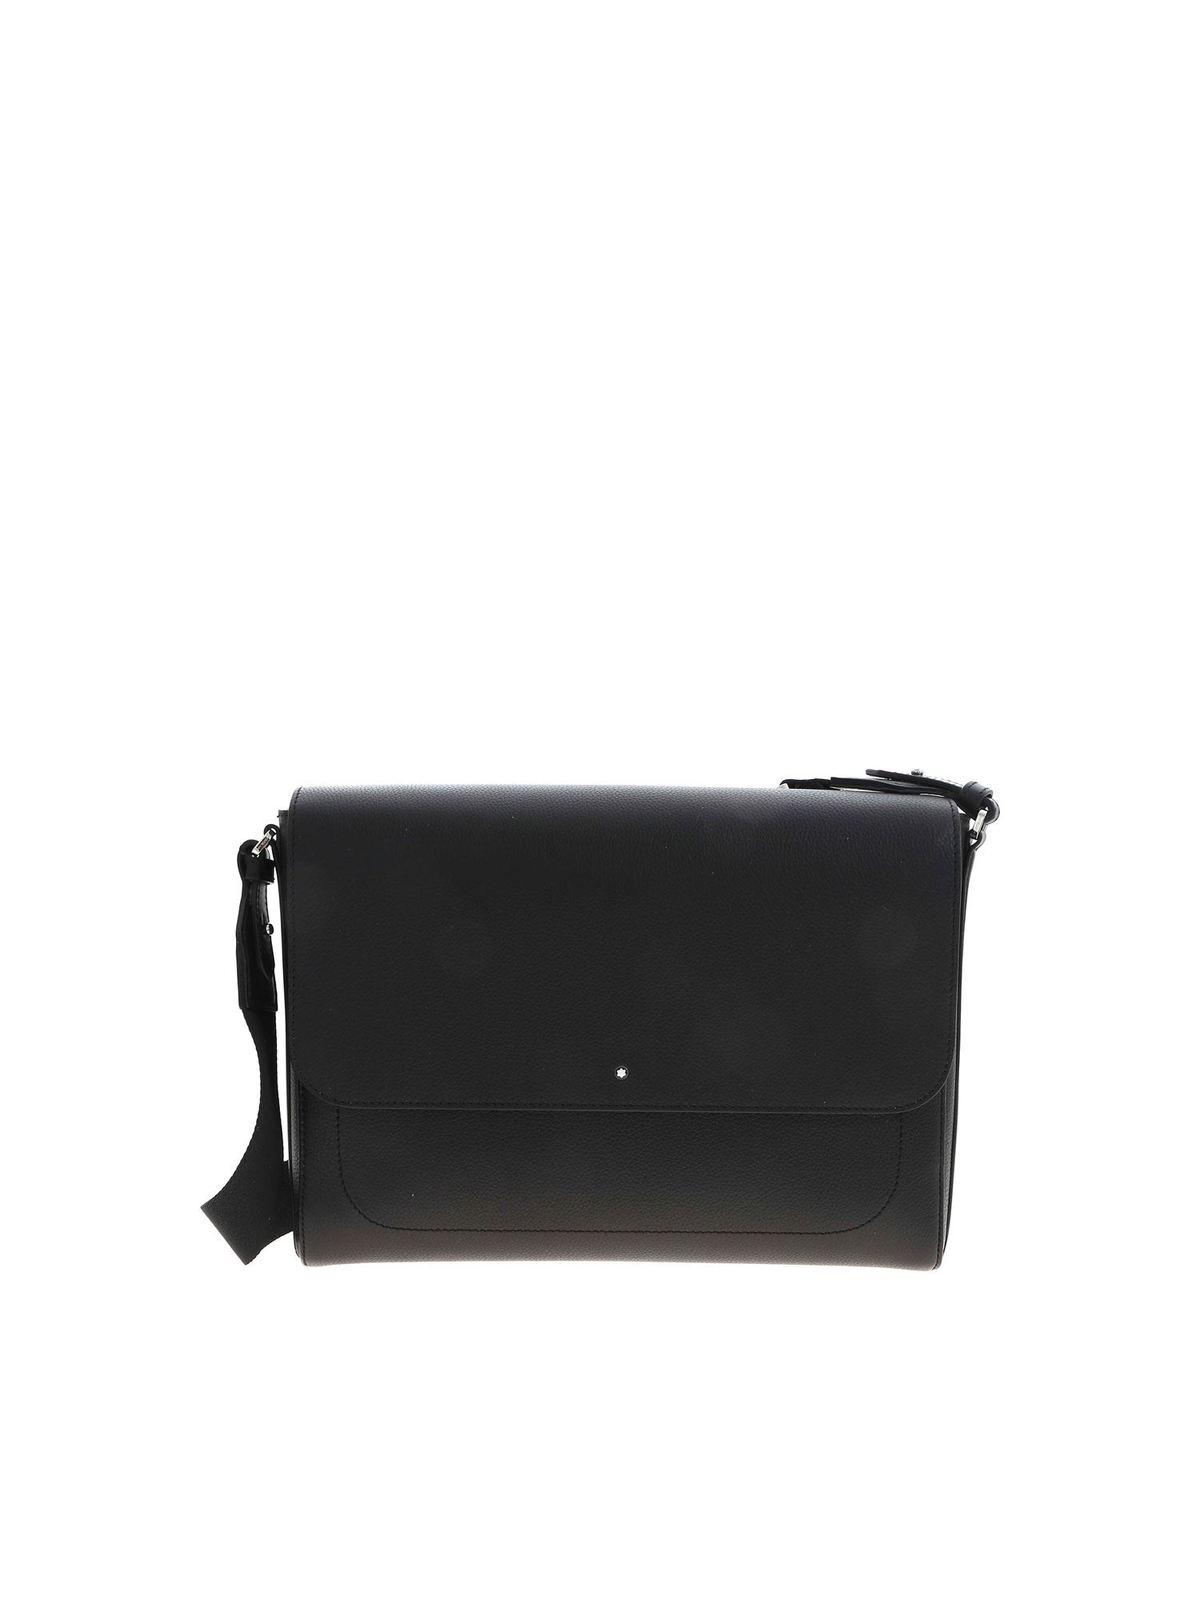 Montblanc Leathers MESSENGER CROSSBODY BAG IN BLACK